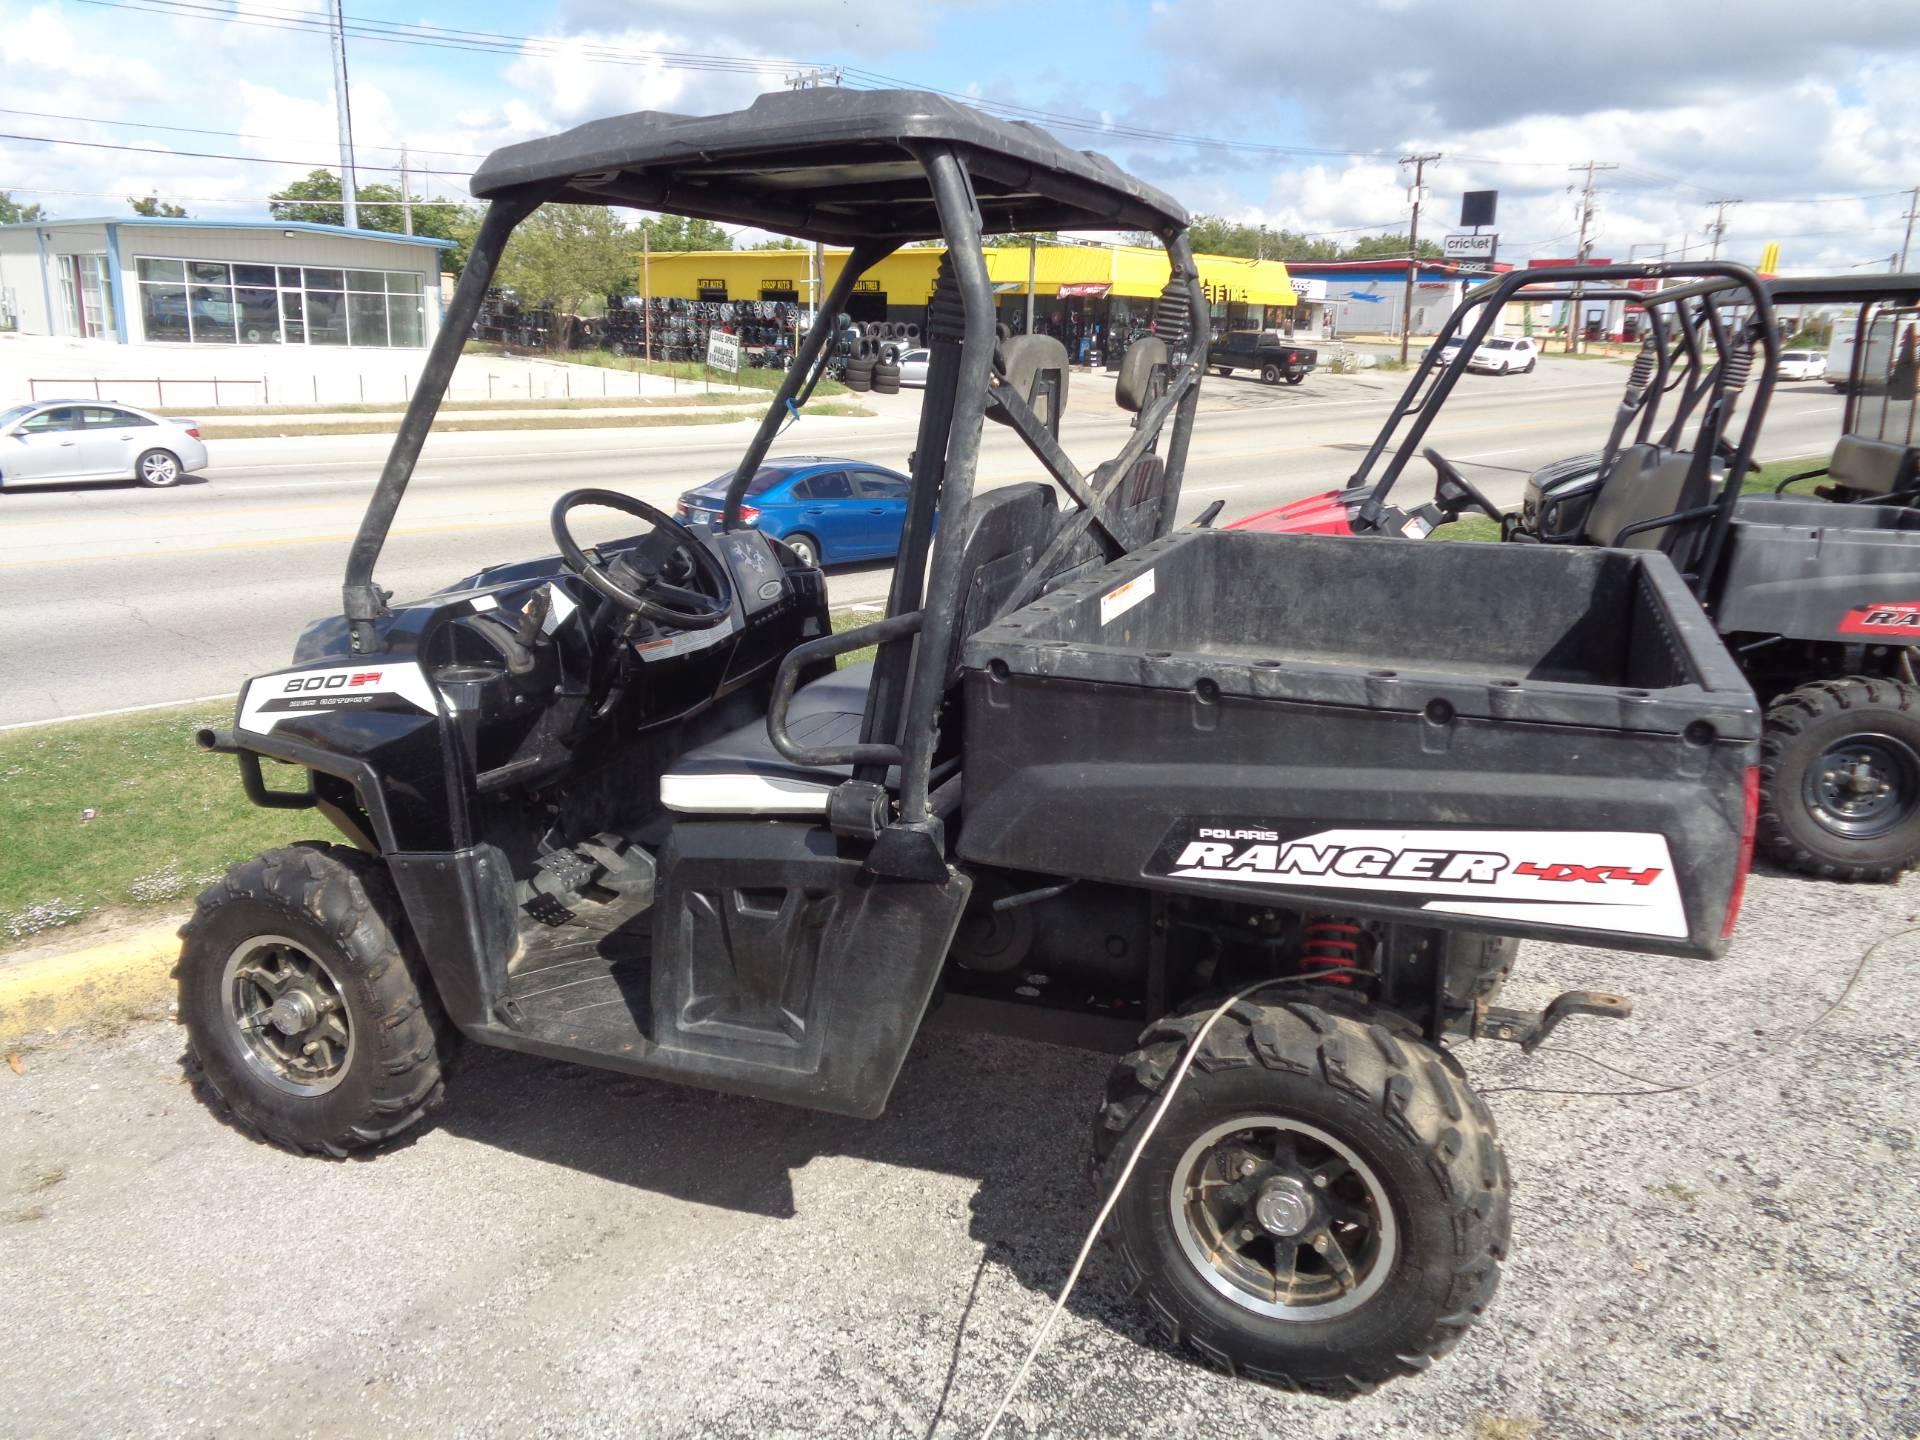 Used 2013 Polaris Ranger® 800 EPS LE Utility Vehicles in Tulsa, OK Golf Cart Gauge Cket on golf cart electronics, golf cart lamps, golf cart lights, golf cart cooling system, golf cart labels, golf cart gears, golf cart hoods, golf cart fuel, golf cart start up, golf cart brushes, golf cart regulator, golf cart exterior, golf cart wiring, golf cart tubing, golf cart actuators, golf cart switches, golf cart relays, golf cart clip art, golf cart product, golf cart cleaning,